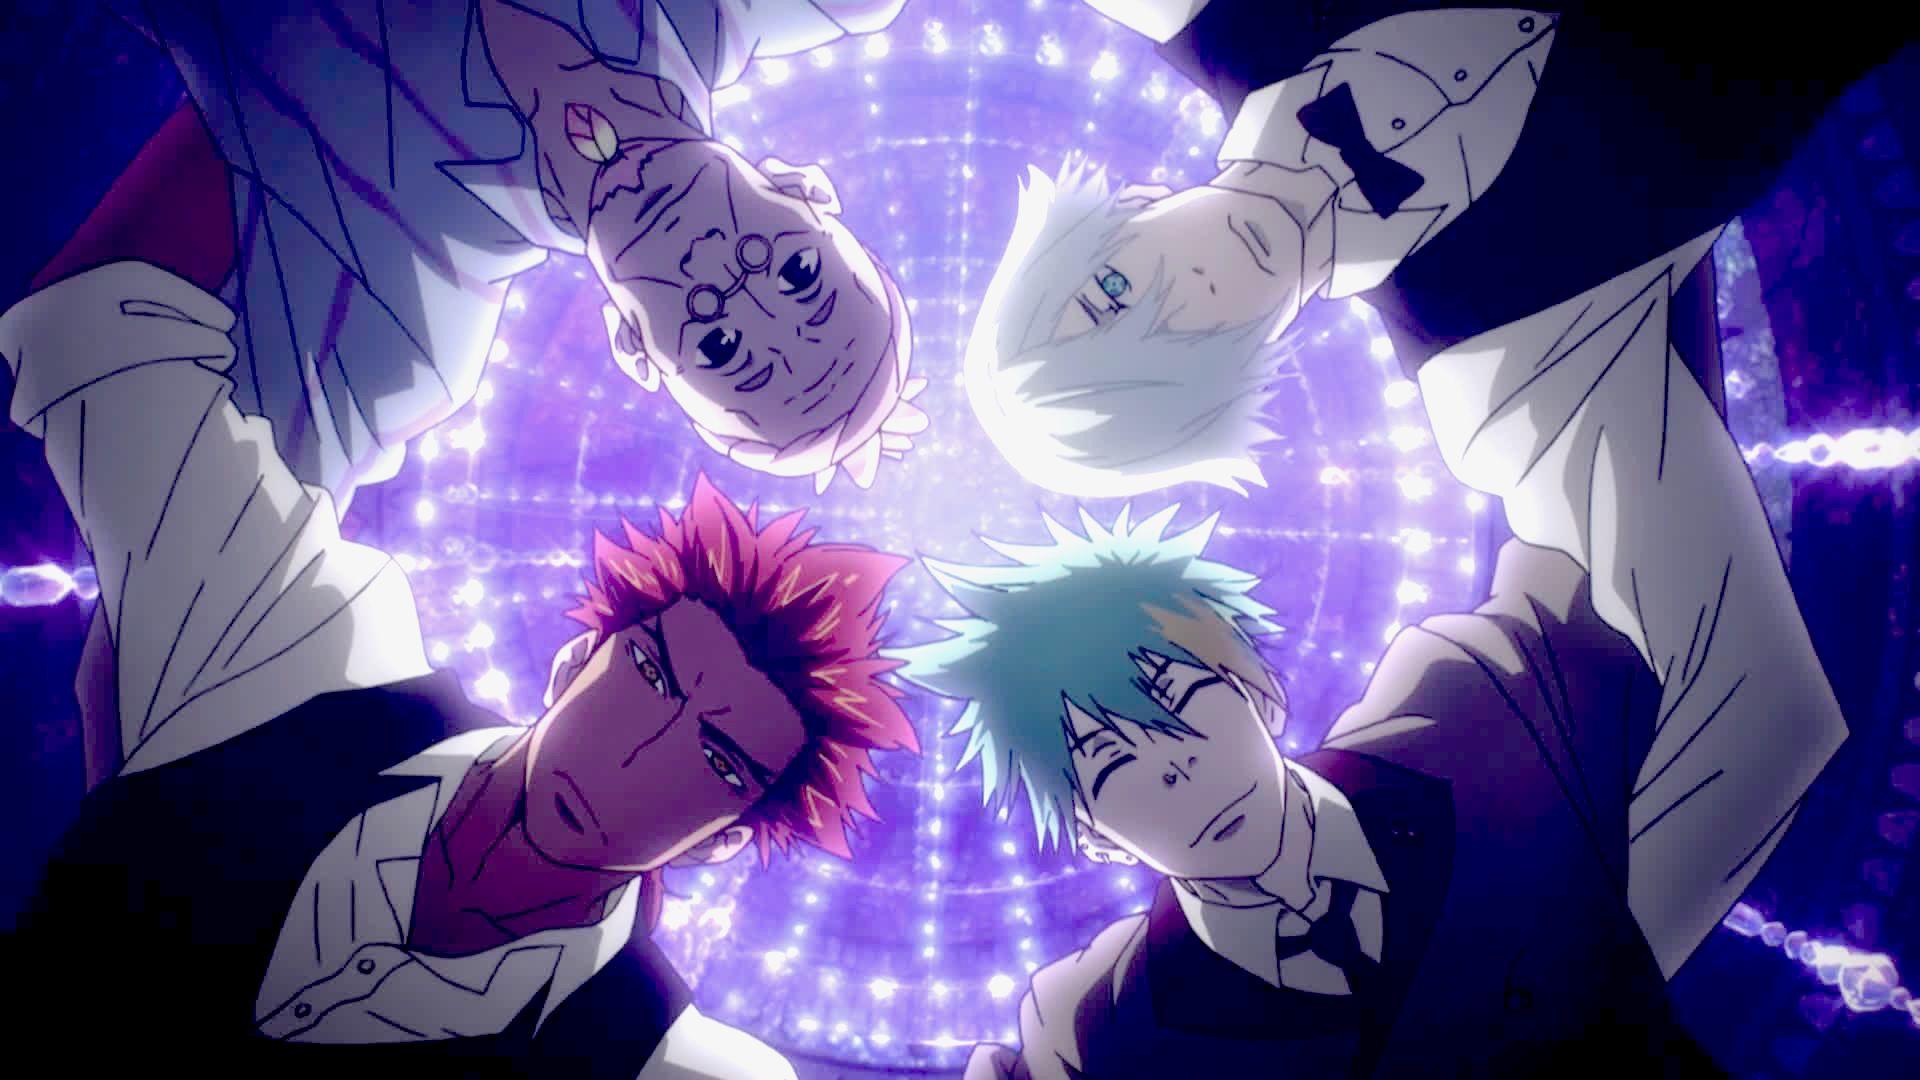 Girls Und Panzer Hd Wallpaper Death Parade Anime Animeclick It